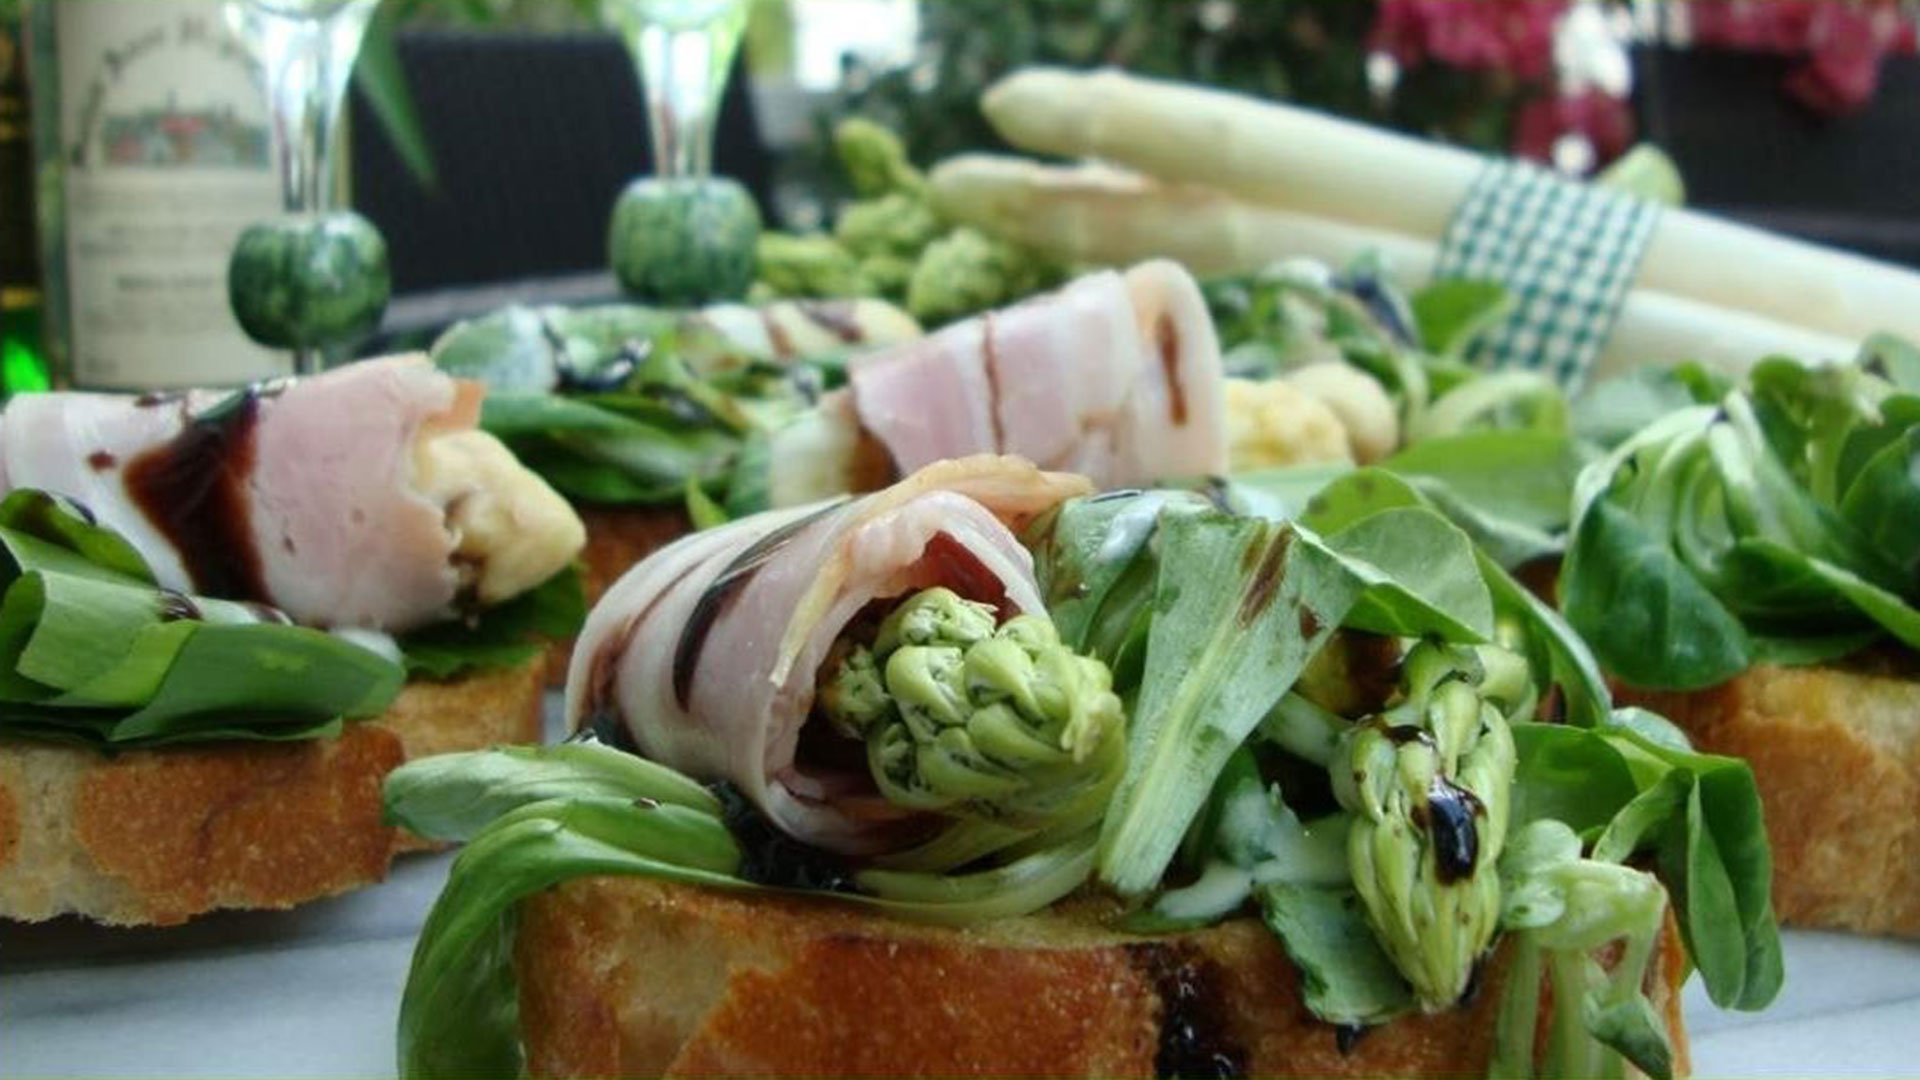 Spargelspitzen auf Baguette mit Hopfen-Secco-Marinade